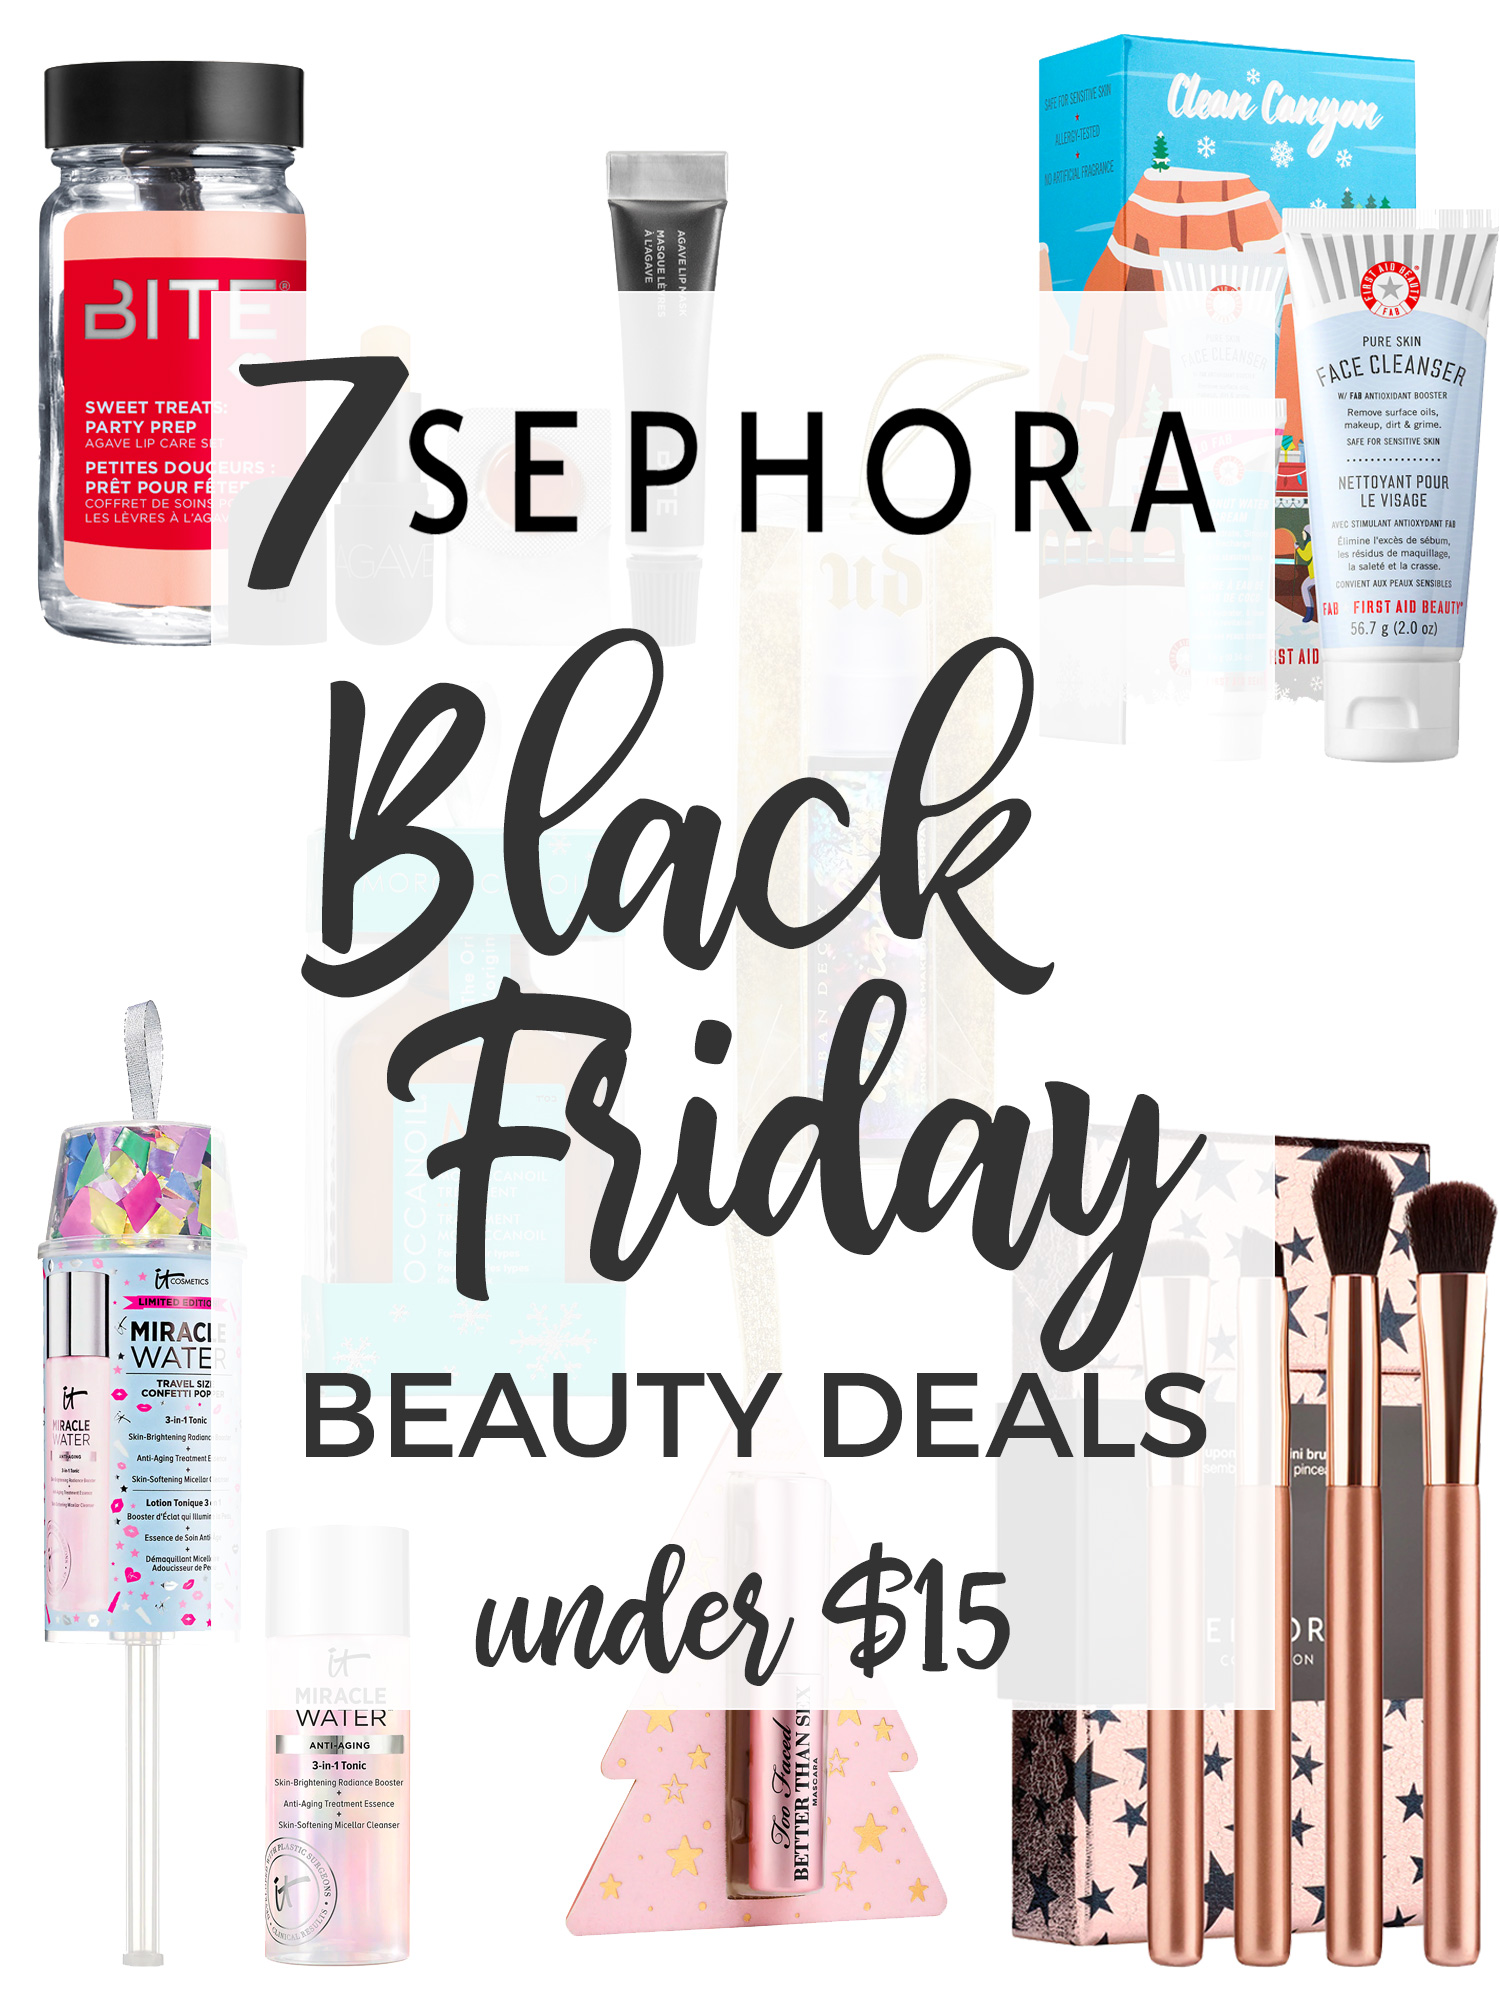 7 Sephora Black Friday Beauty Deals under $15